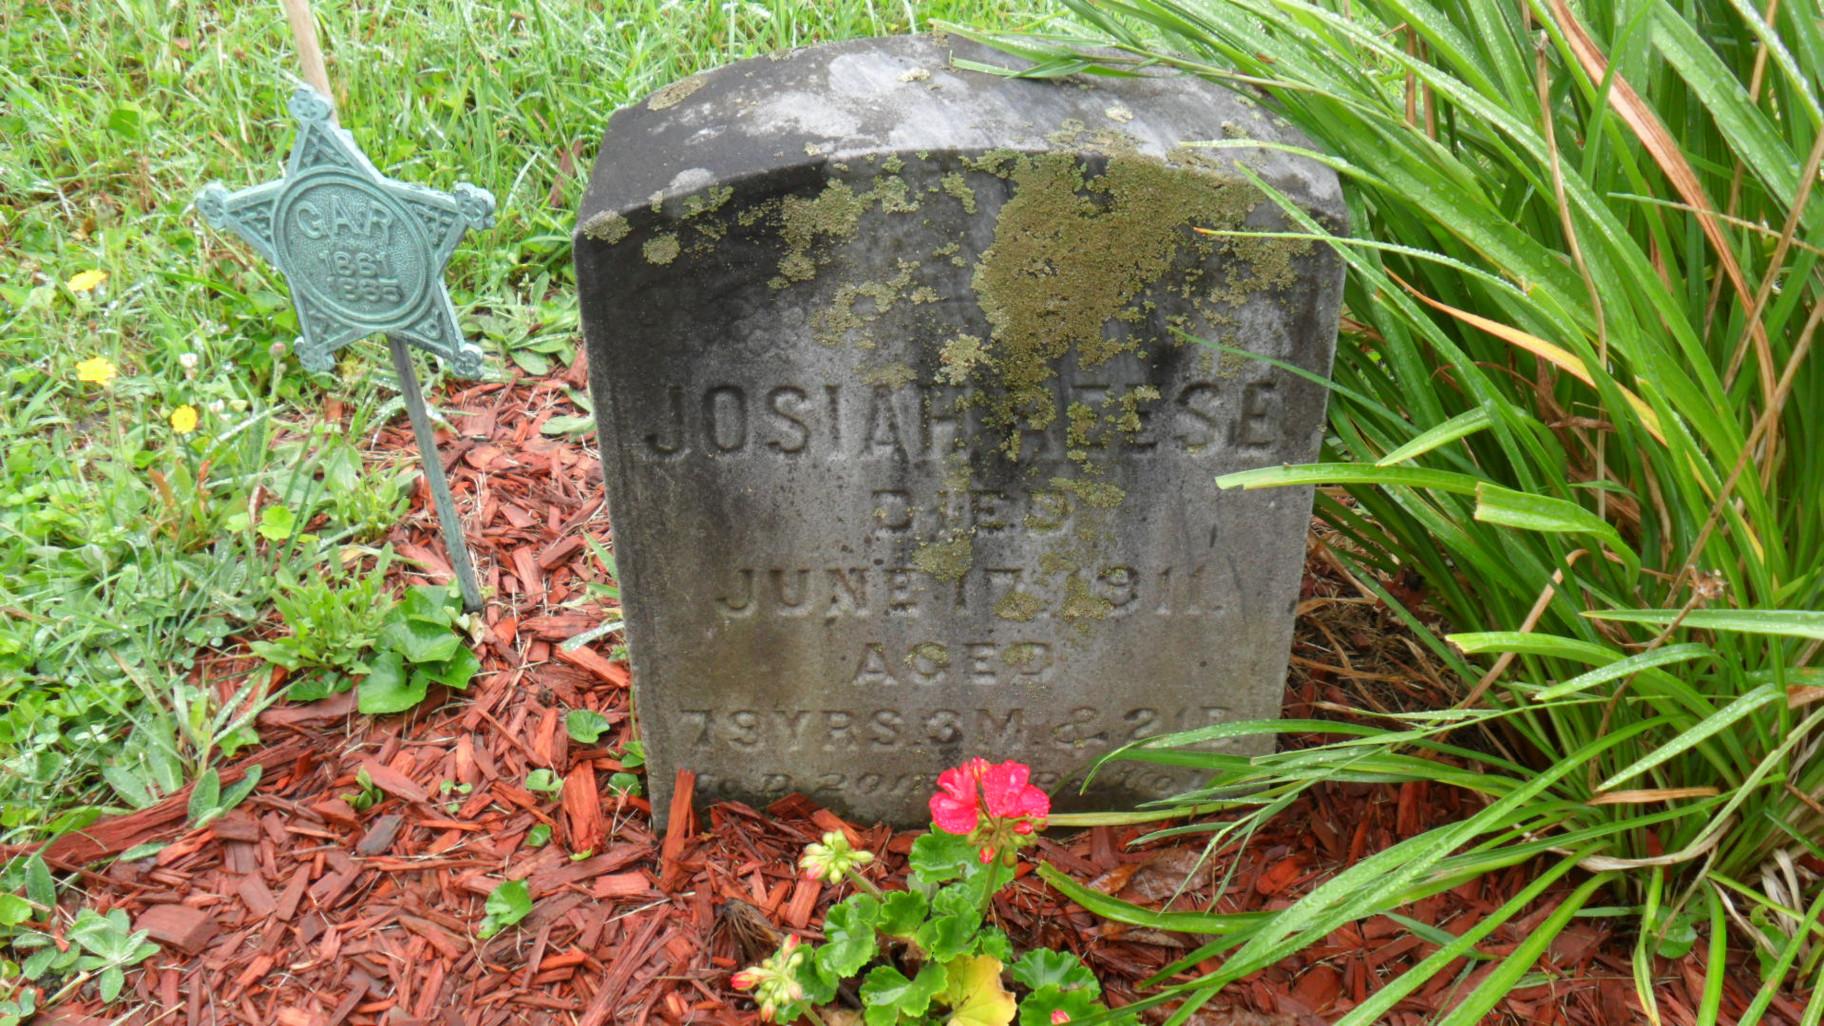 Josiah Reese burial at Franklin Stone Heap Cemetery